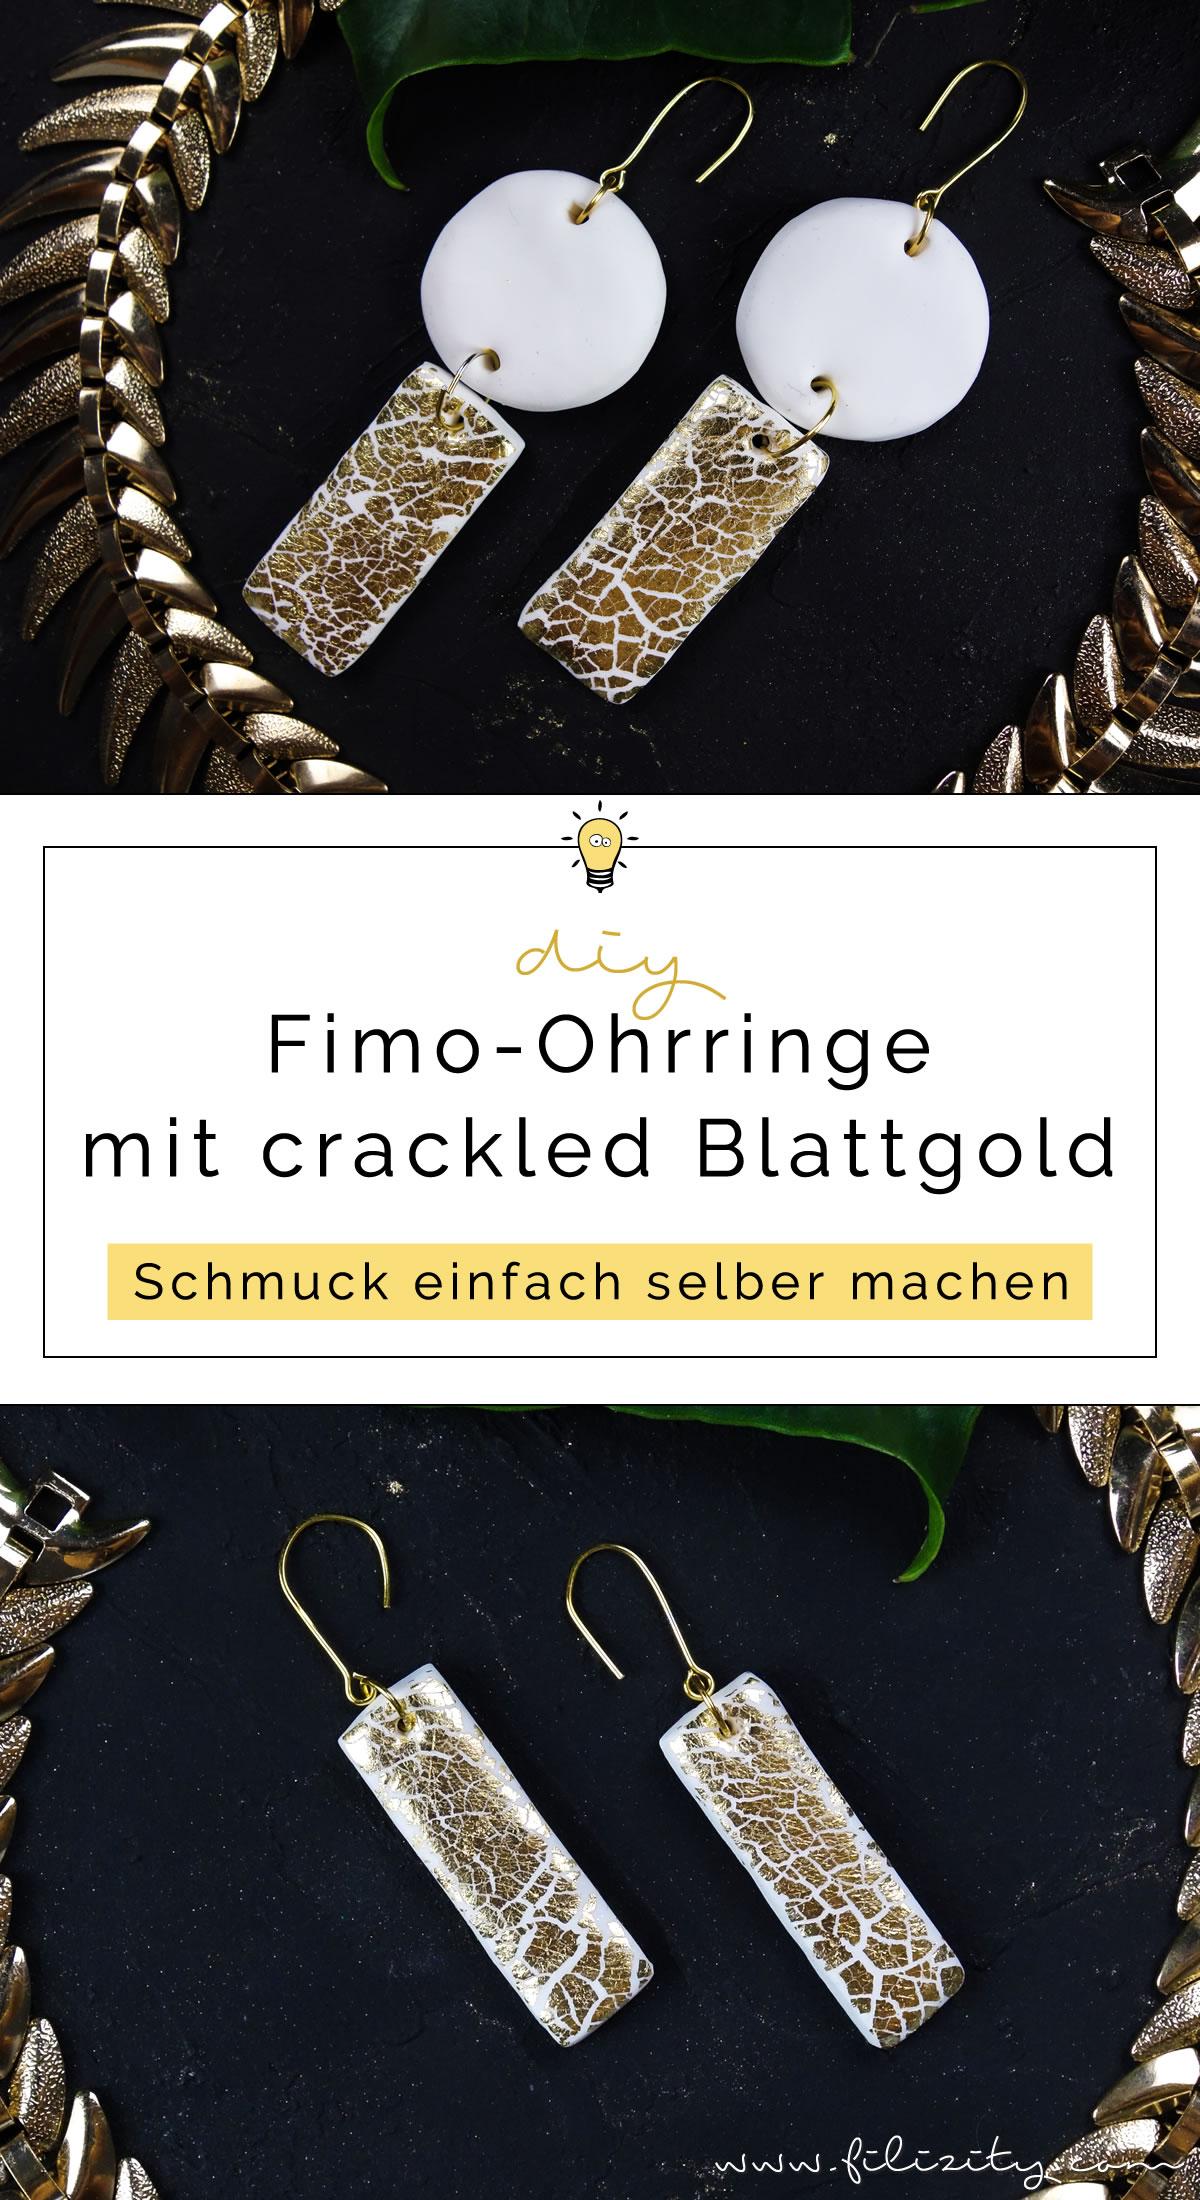 DIY Fimo Ohrringe mit Crackle-Gold | Fimo Schmuck selber machen - 5 Blogs 1000 Ideen | Filizity.com | DIY-Blog aus dem Rheinland #fimo #gold #crackle #krakelierlack